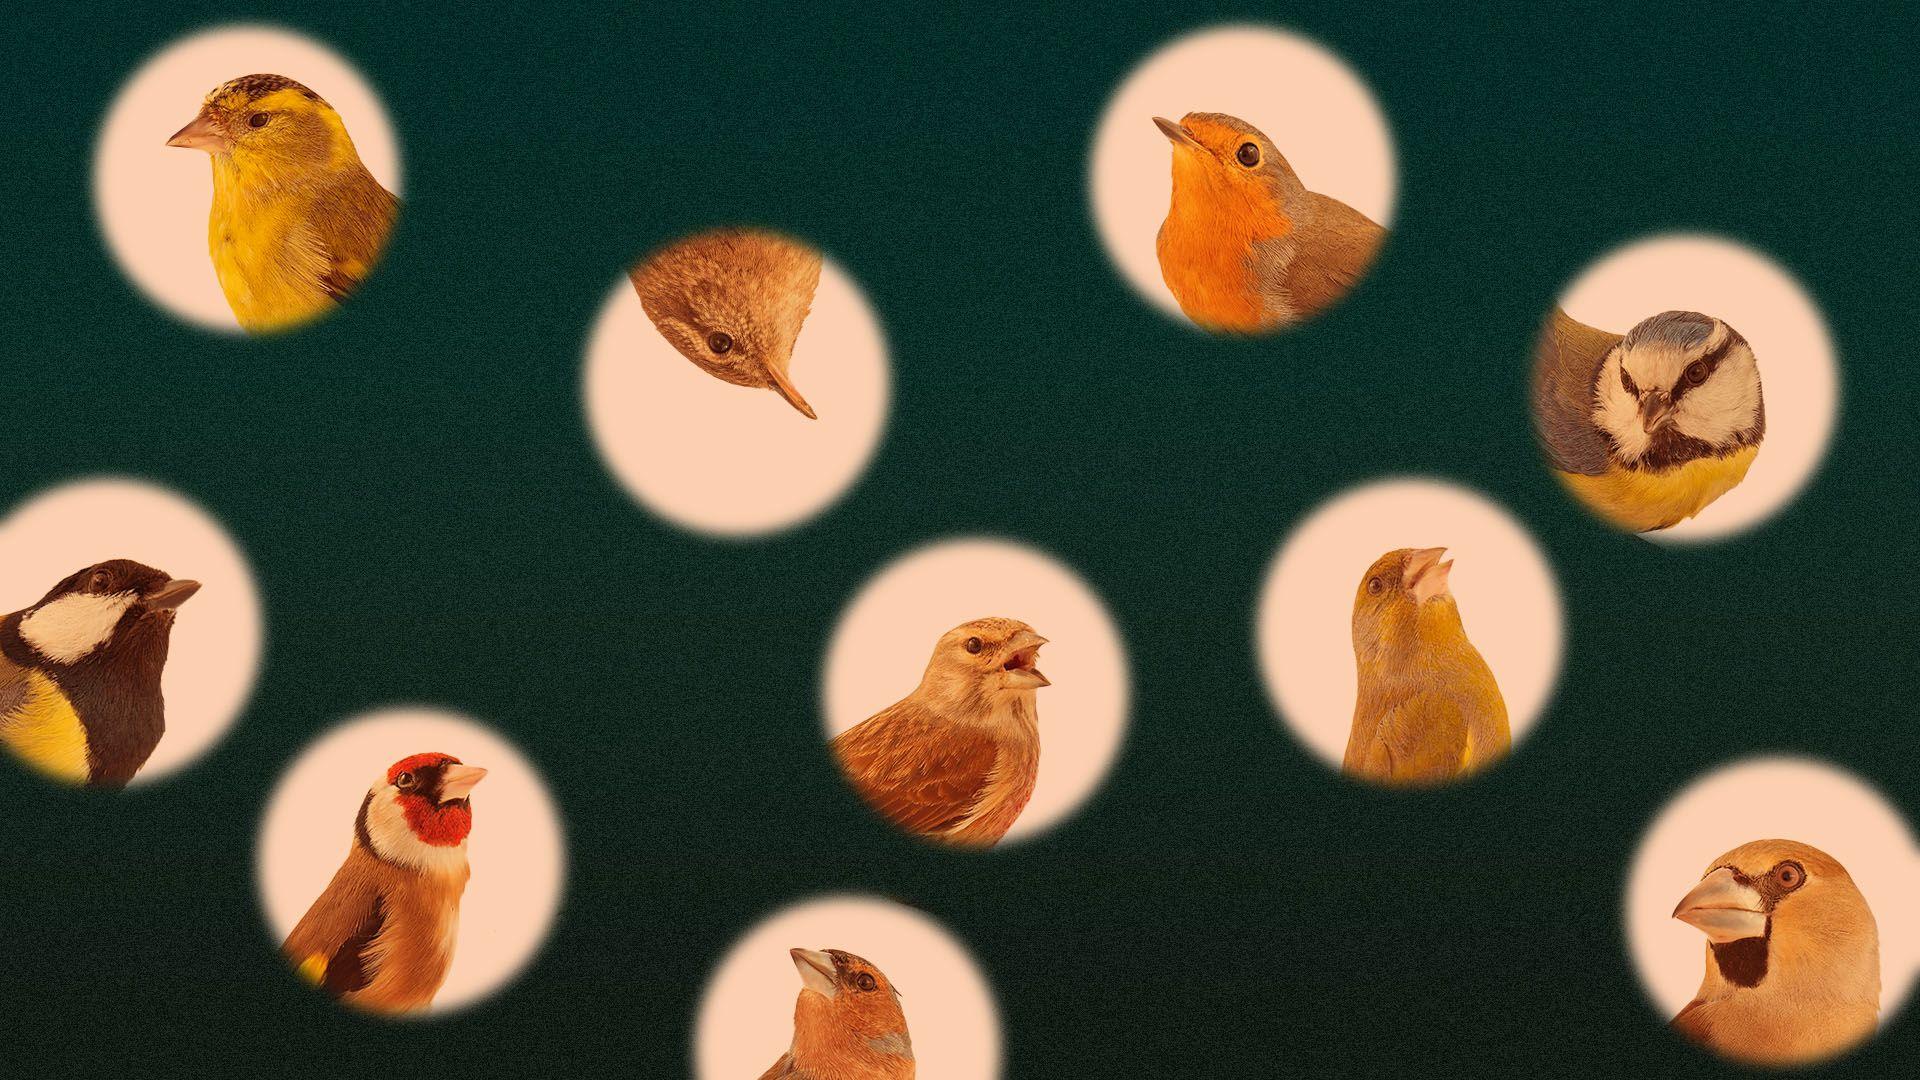 Coronavirus quarantine is a great time to get into birding